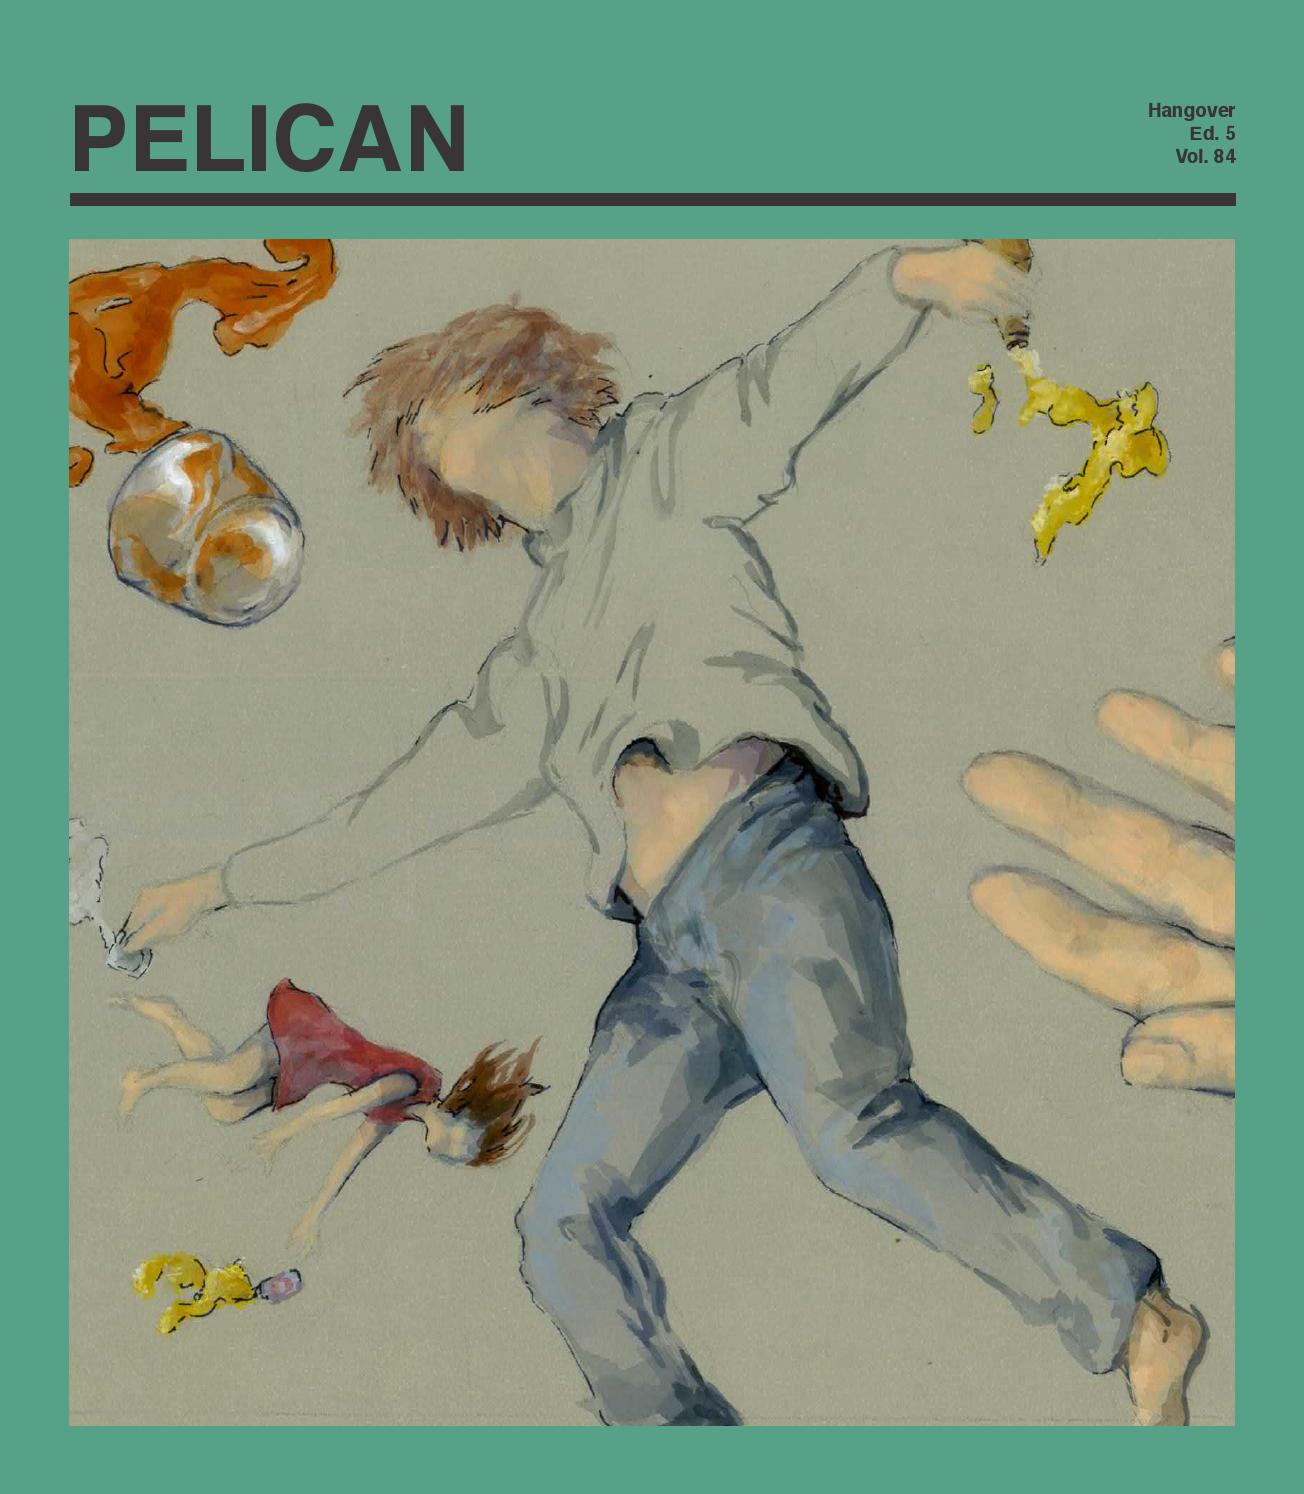 Pelican Edition 5 Volume 84 By Uwa Student Guild Issuu Andrew Smith Green Denim Hijau 30